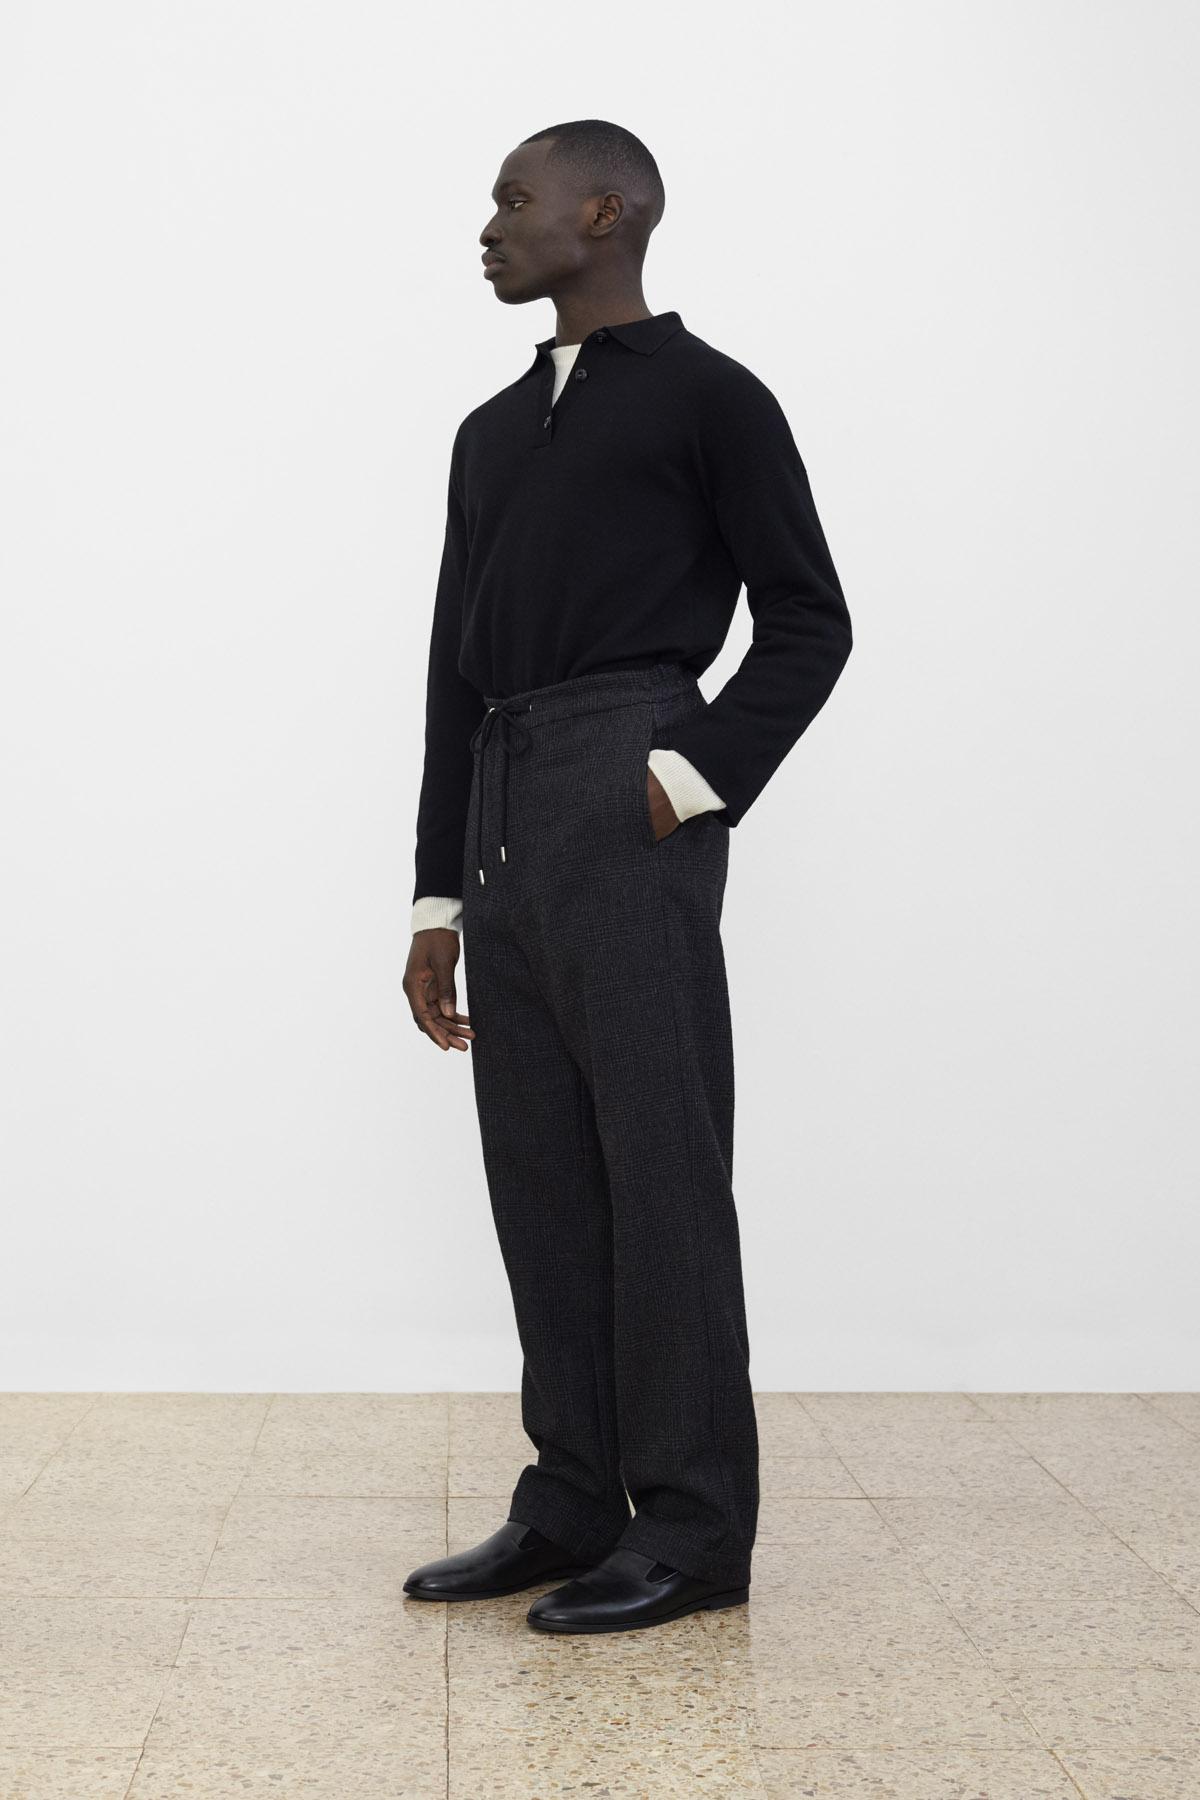 <b>12</b><br>Solo Milano Knit Top<br>Gilbert Boiled Wool Top<br>Hakon Checked Wool Pants